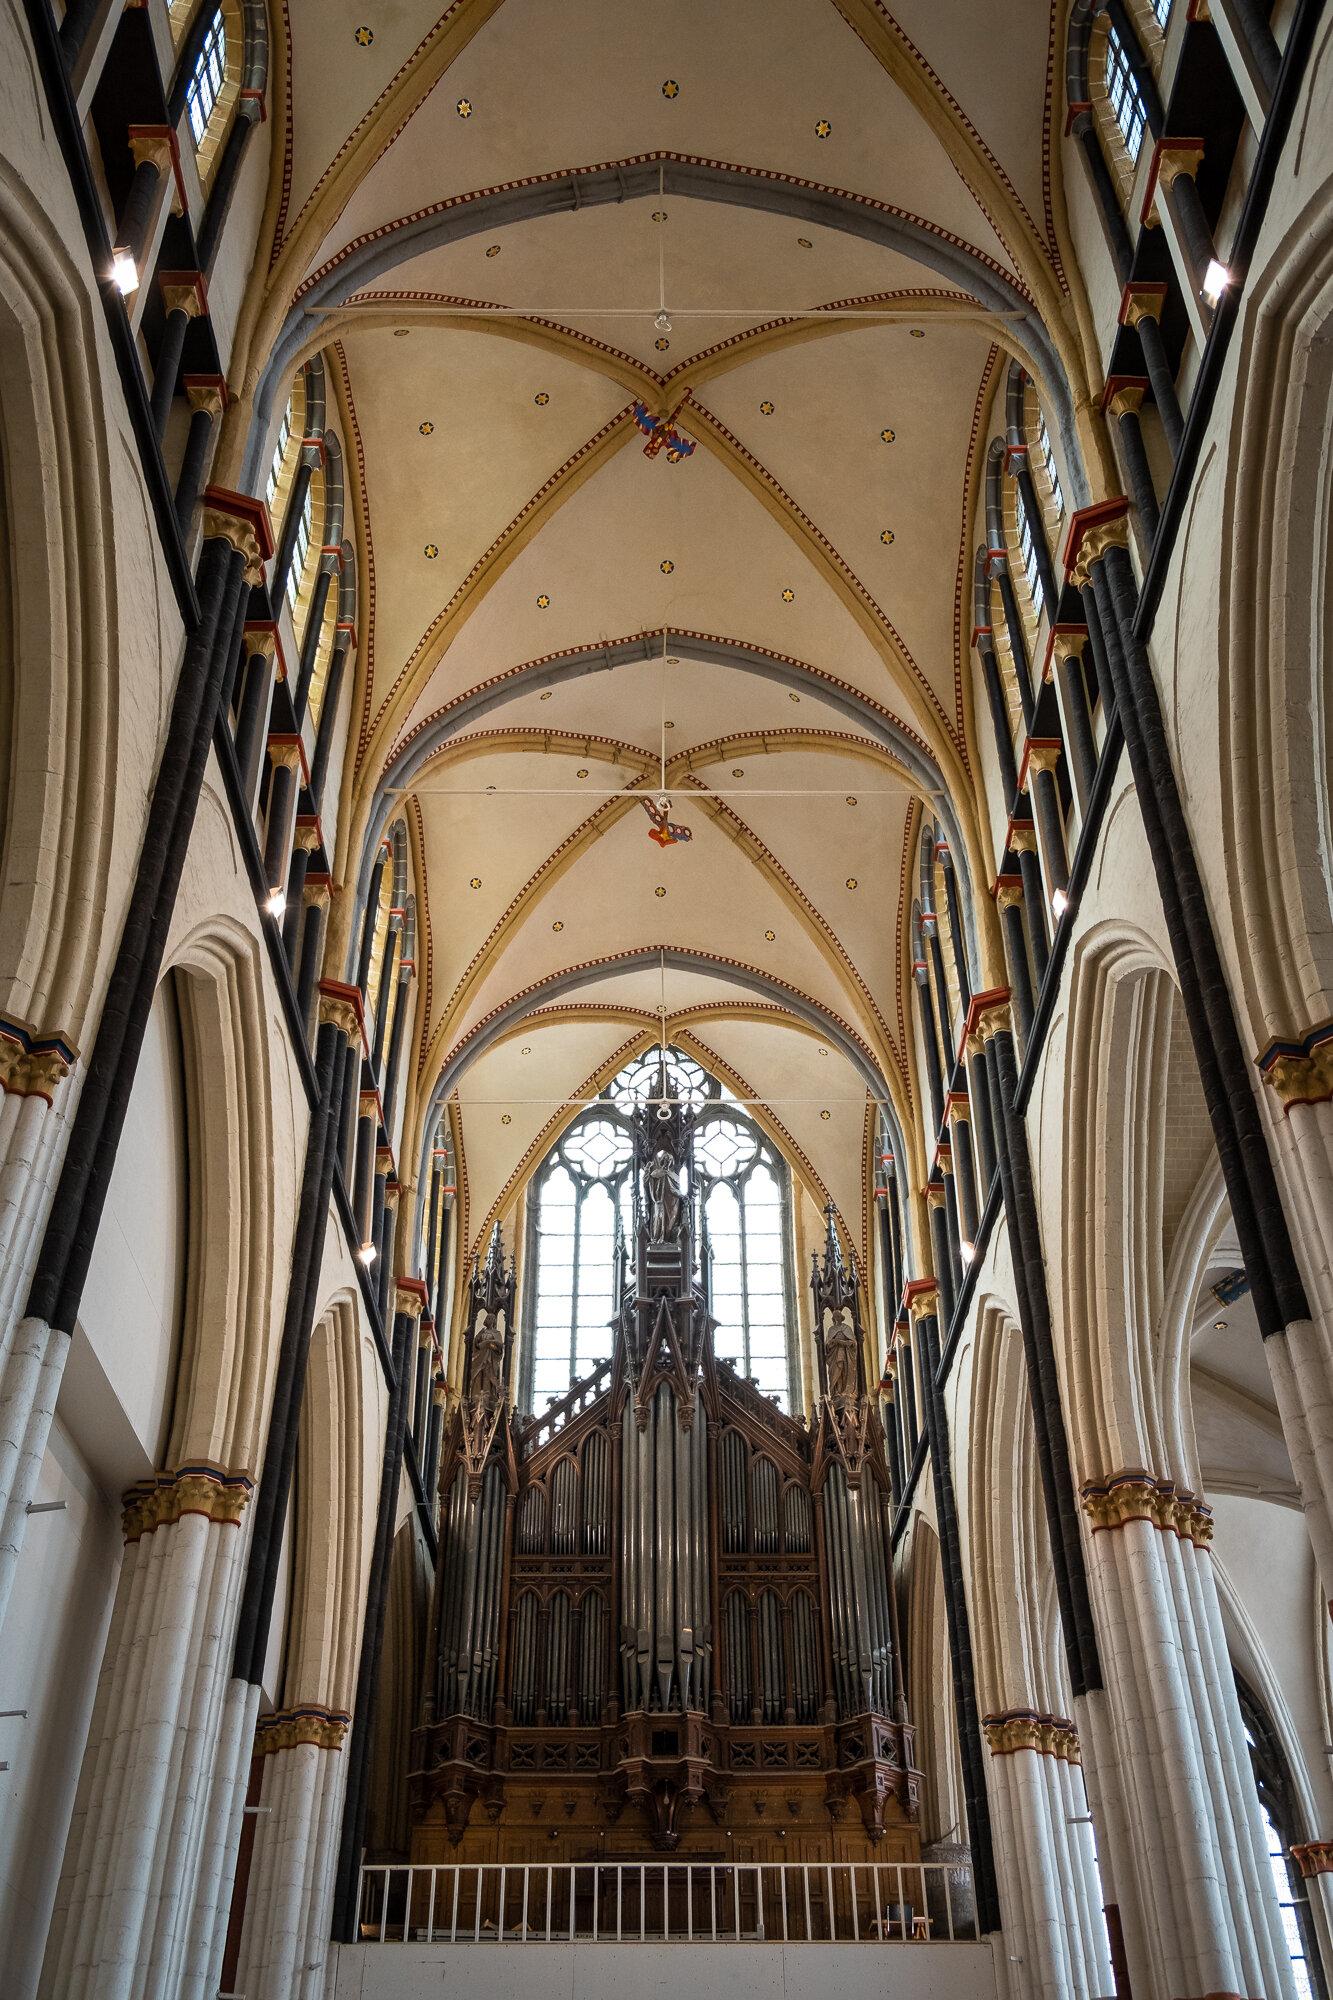 The pipe organ inside St. Nicholas' Church main hall